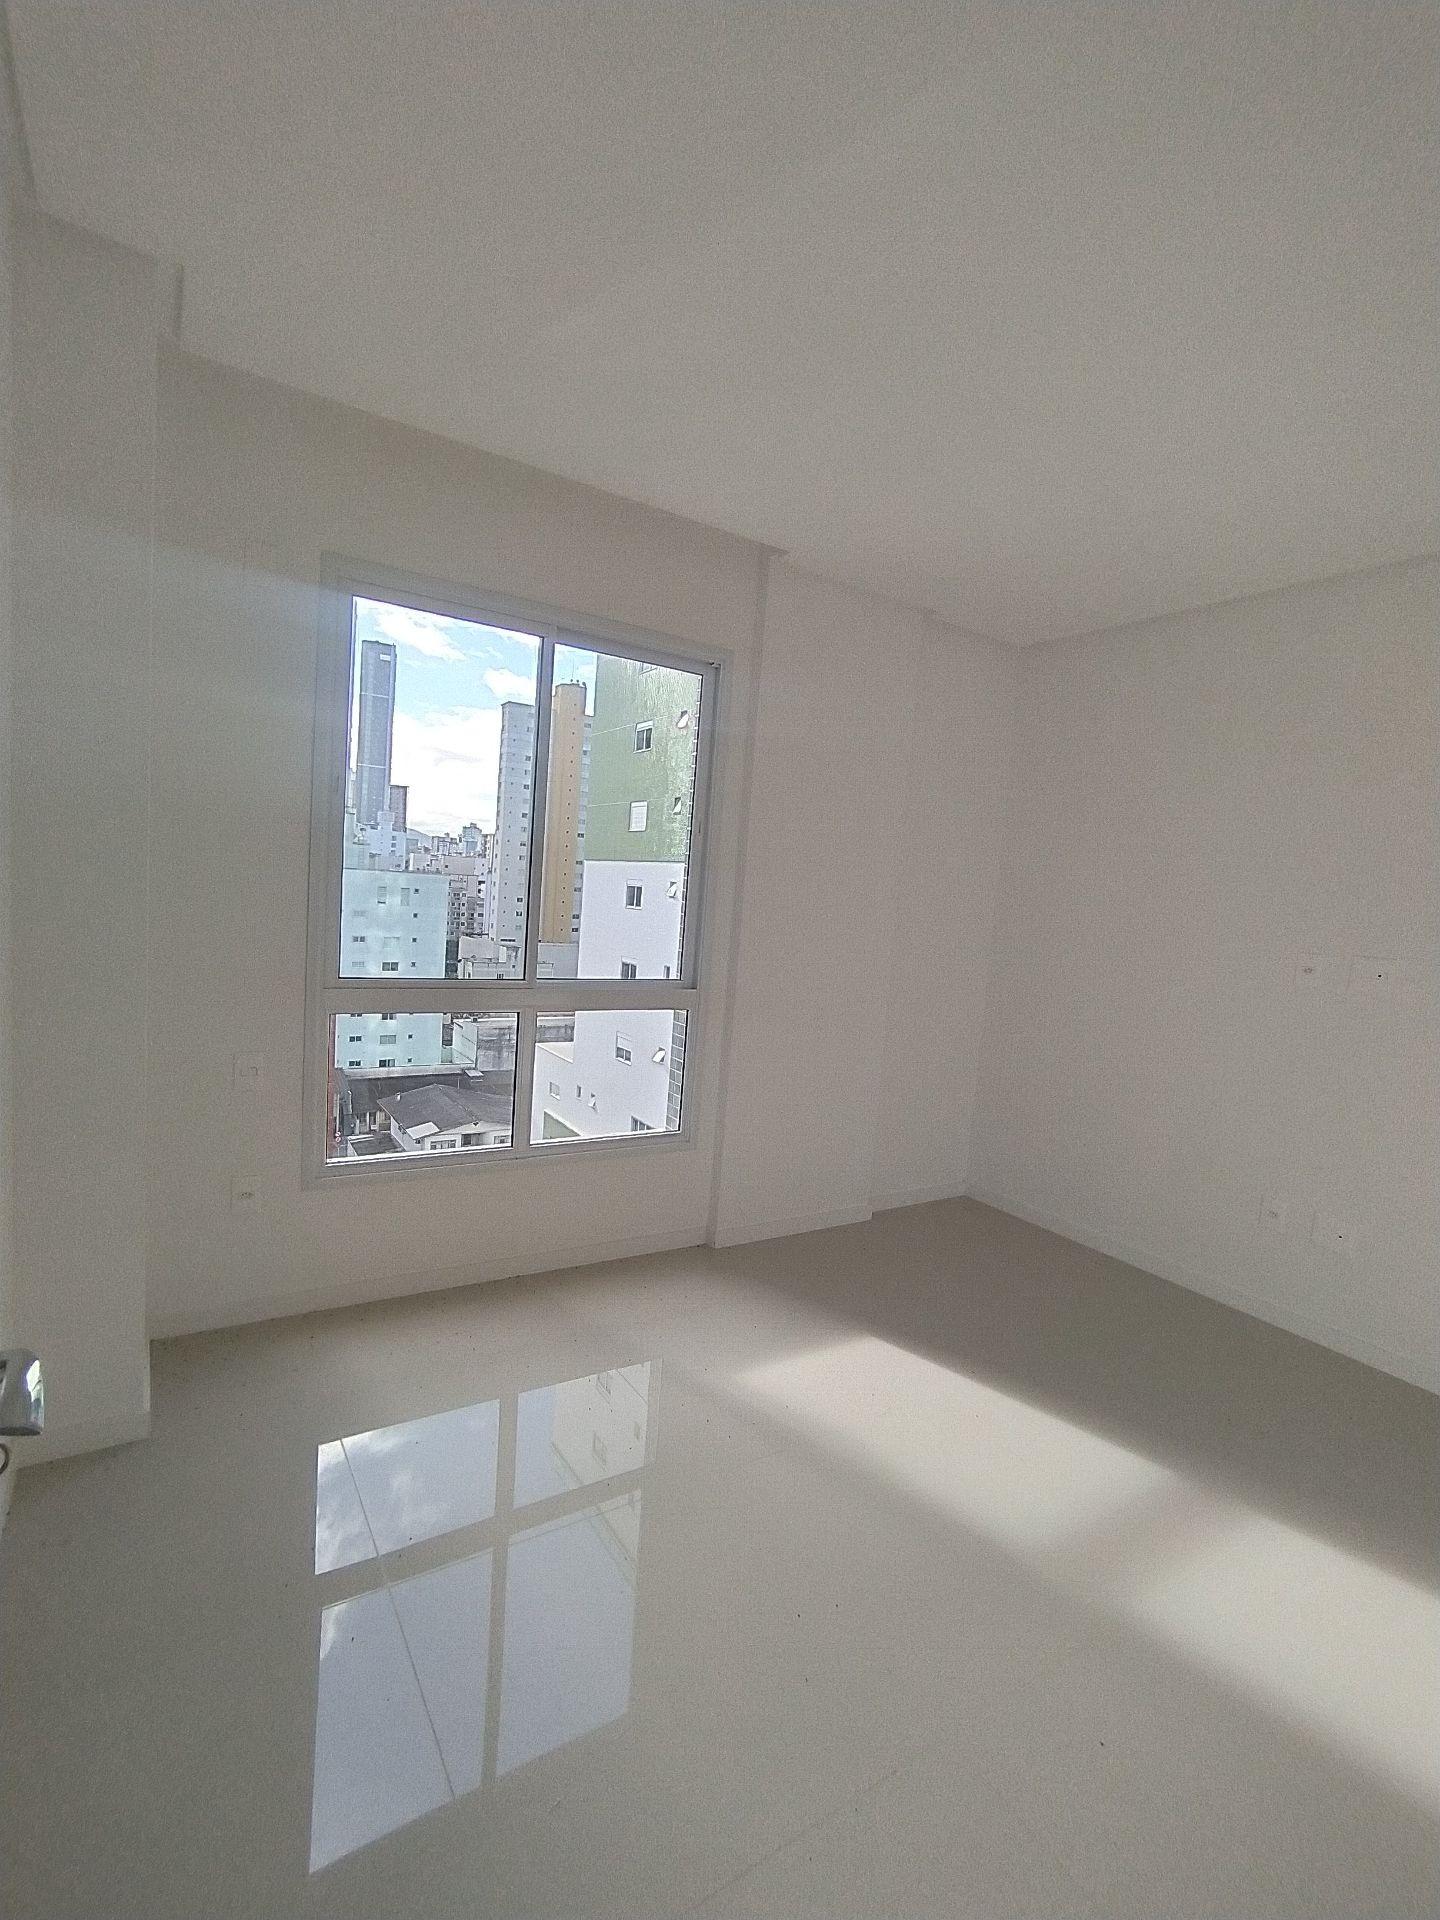 Apartamento novo no Edifício Barcelona Garden no centro de Balneário Camboriú, 3 suítes e 3 vagas de garagem